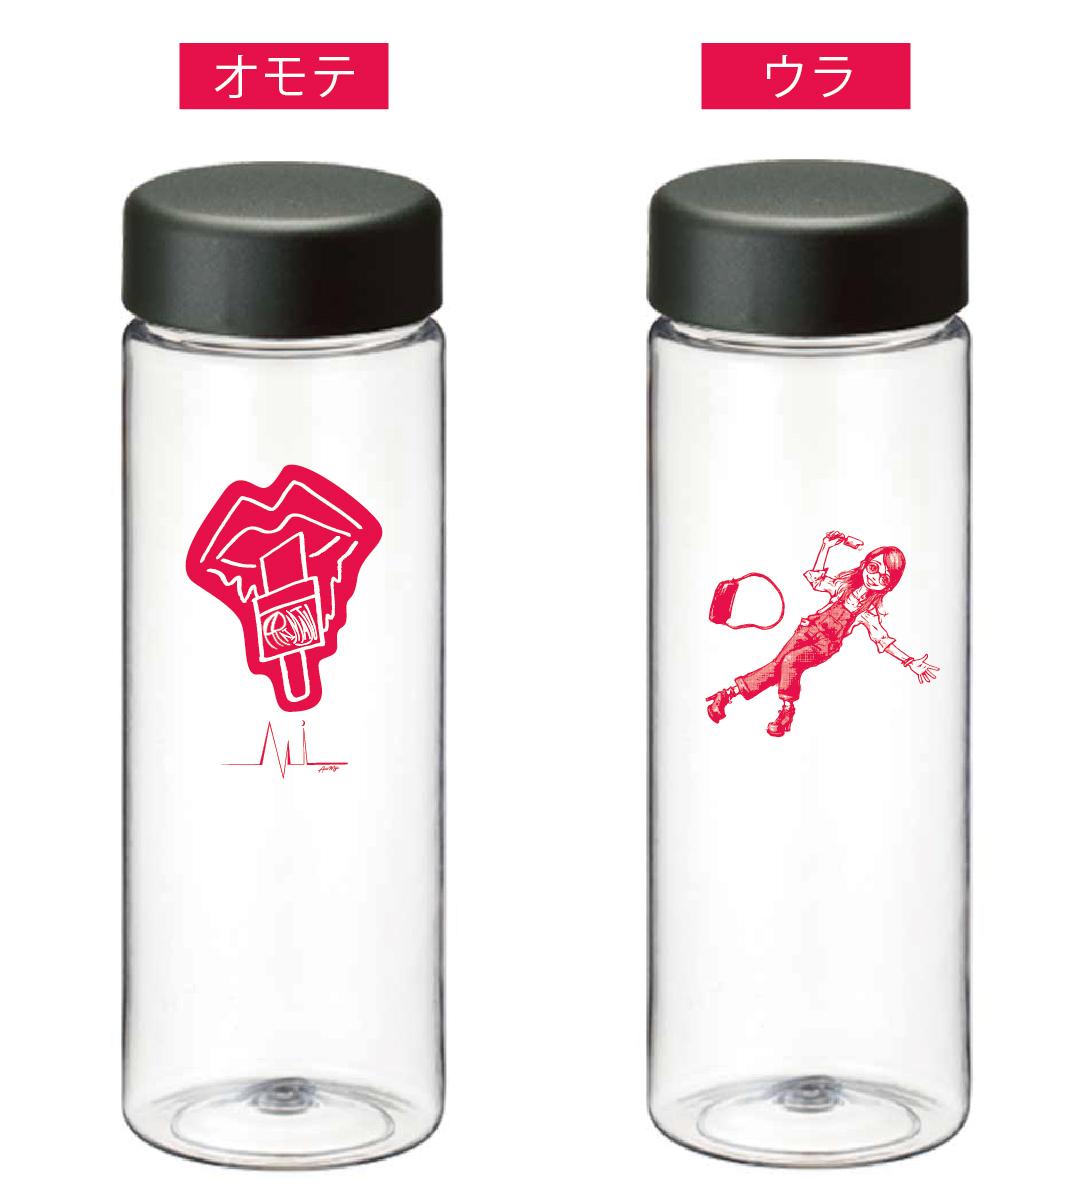 500ml オリジナルイラストクリアボトル